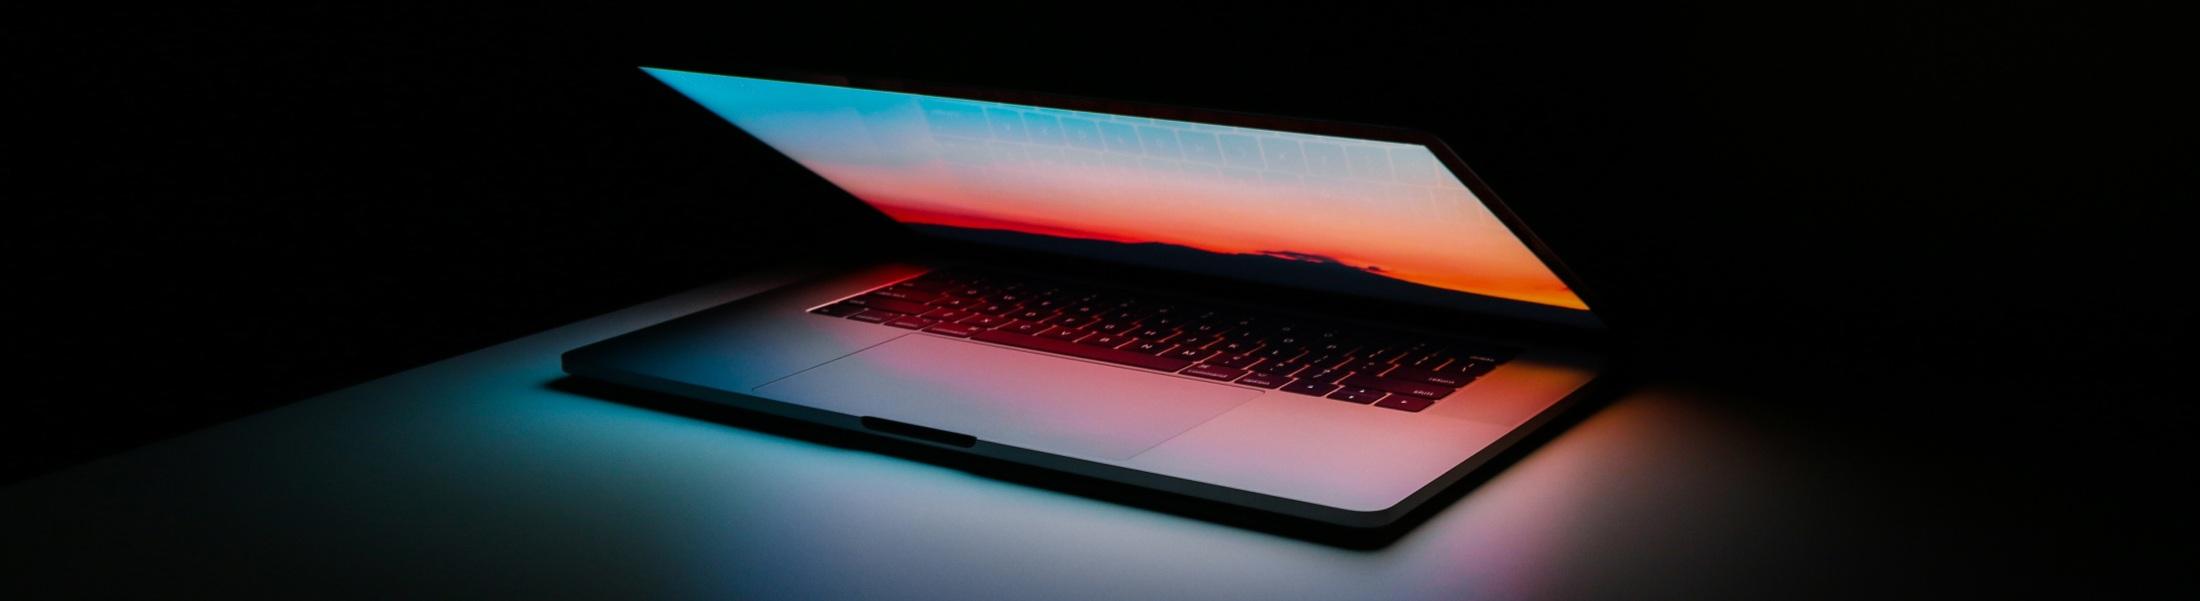 Blog technologiczny TechnoGuru.pl